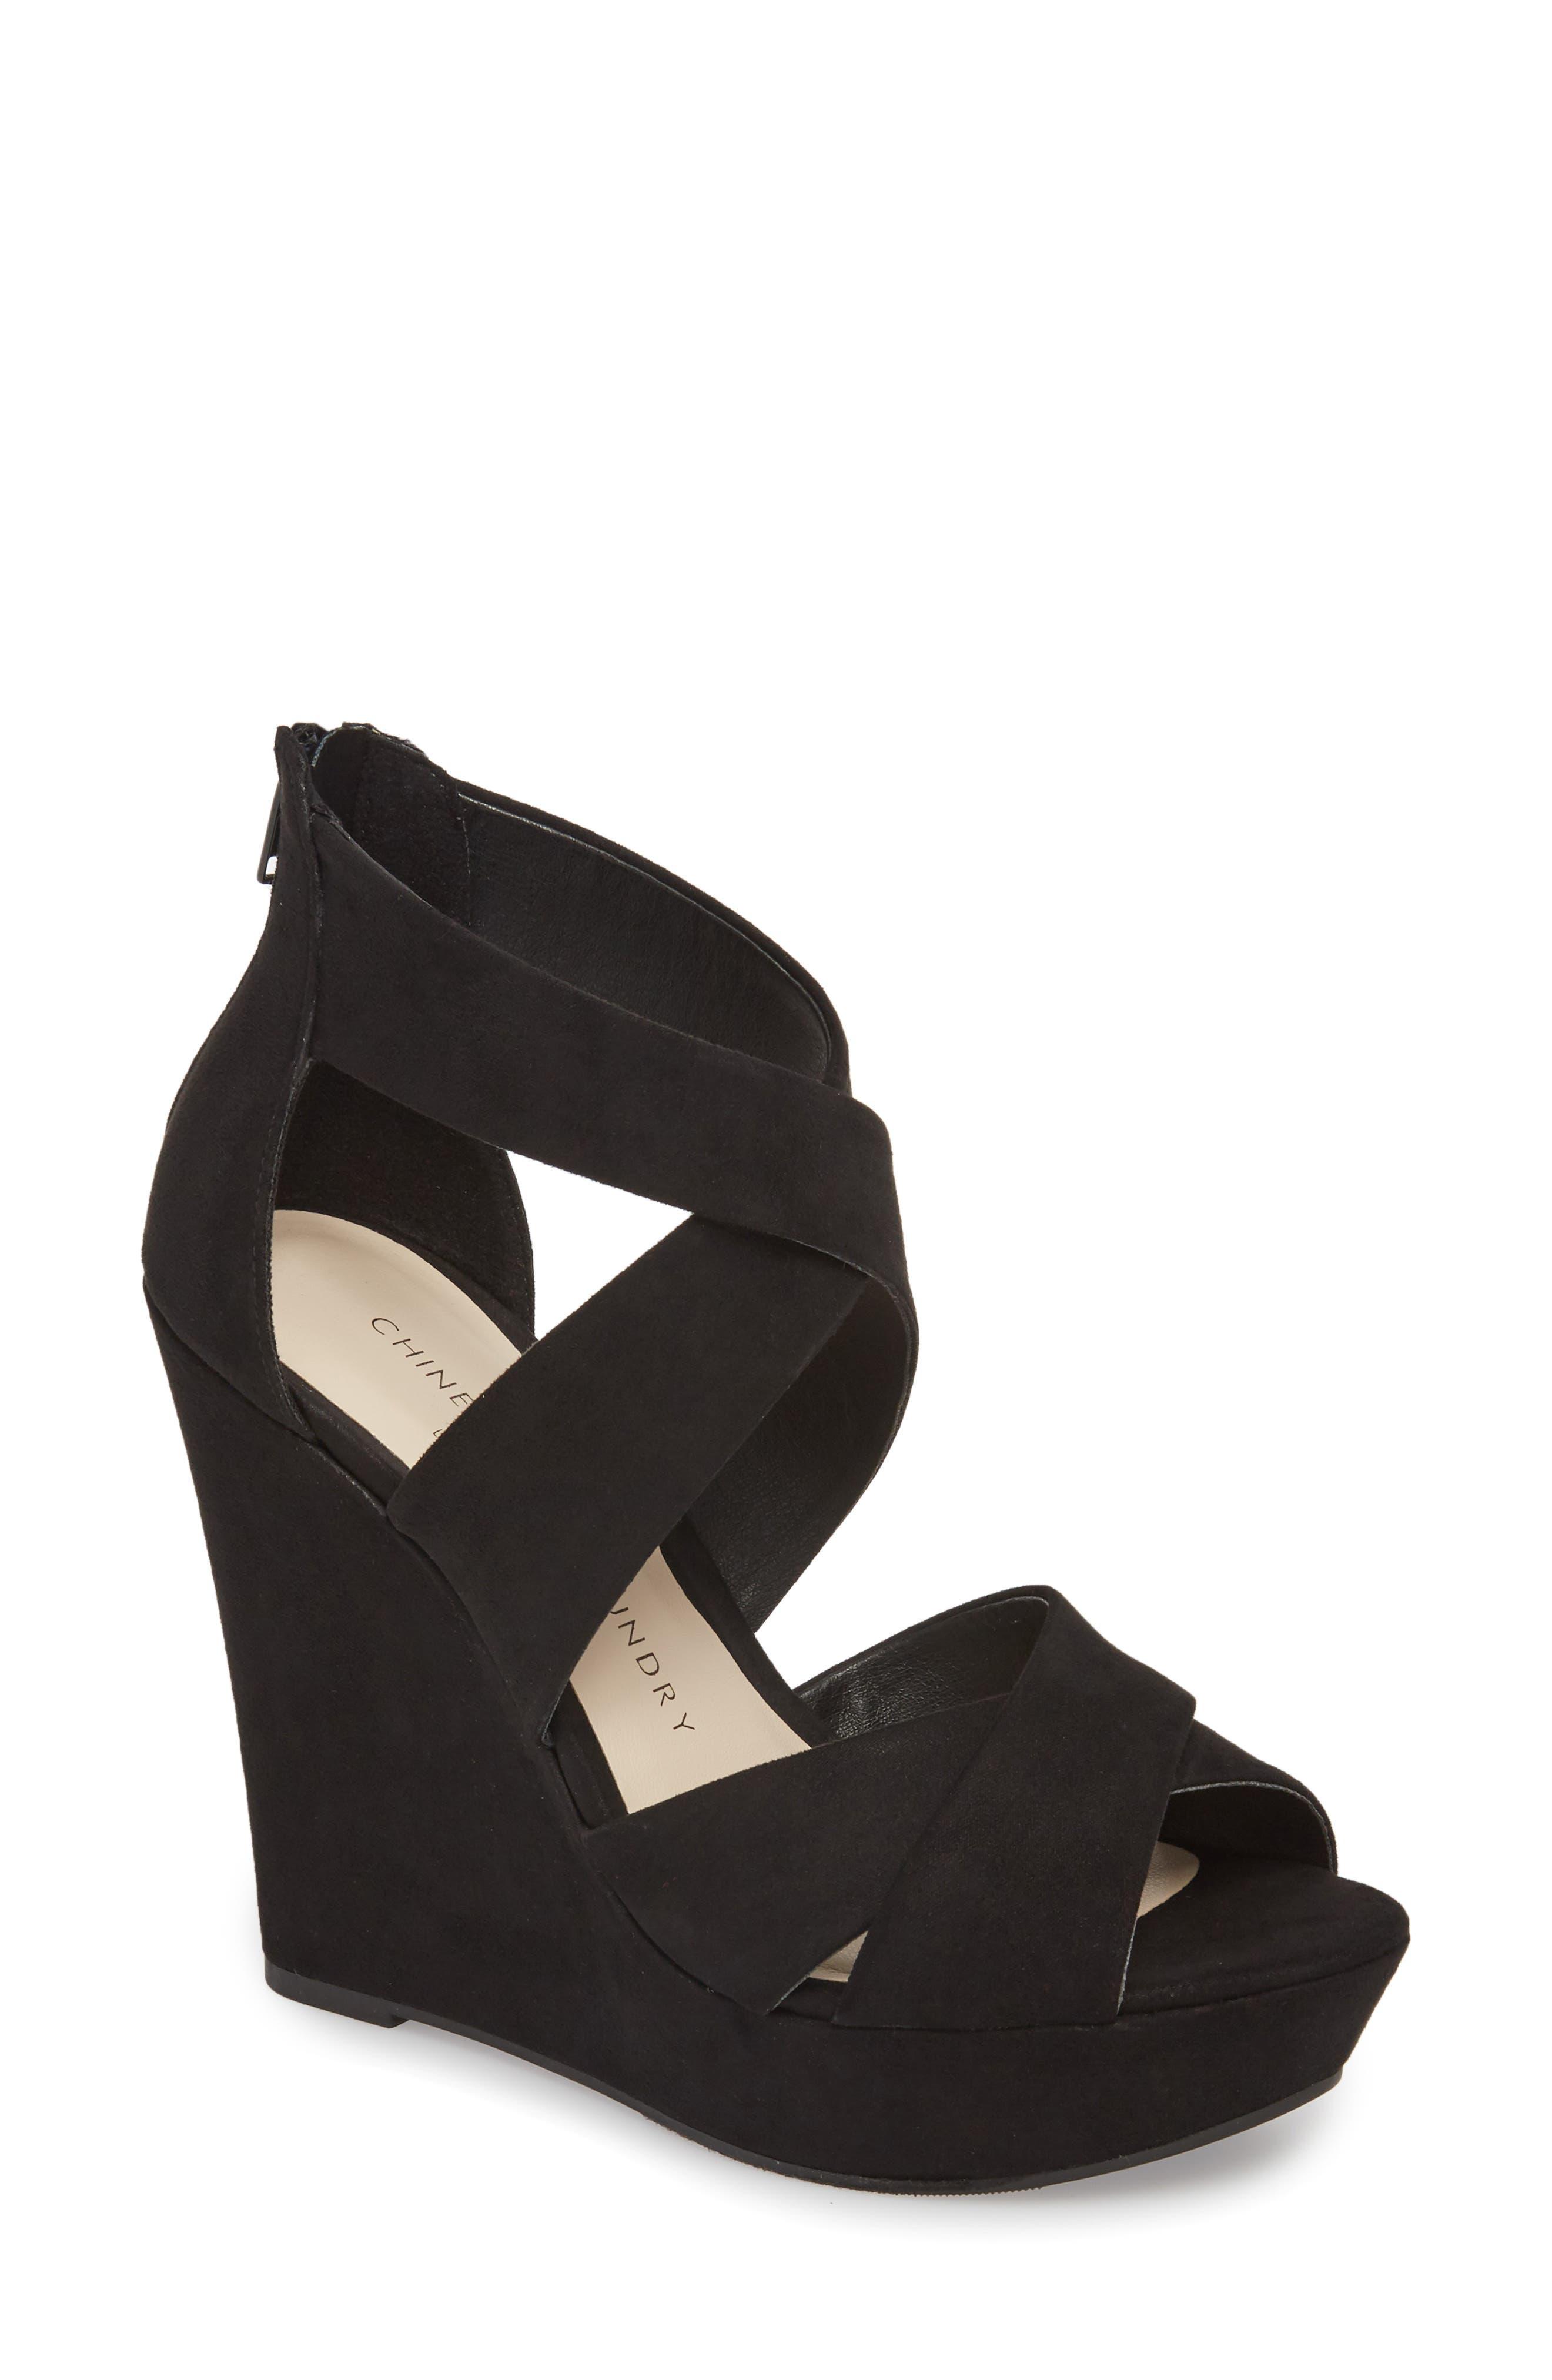 Milani Platform Wedge Sandal,                         Main,                         color, BLACK